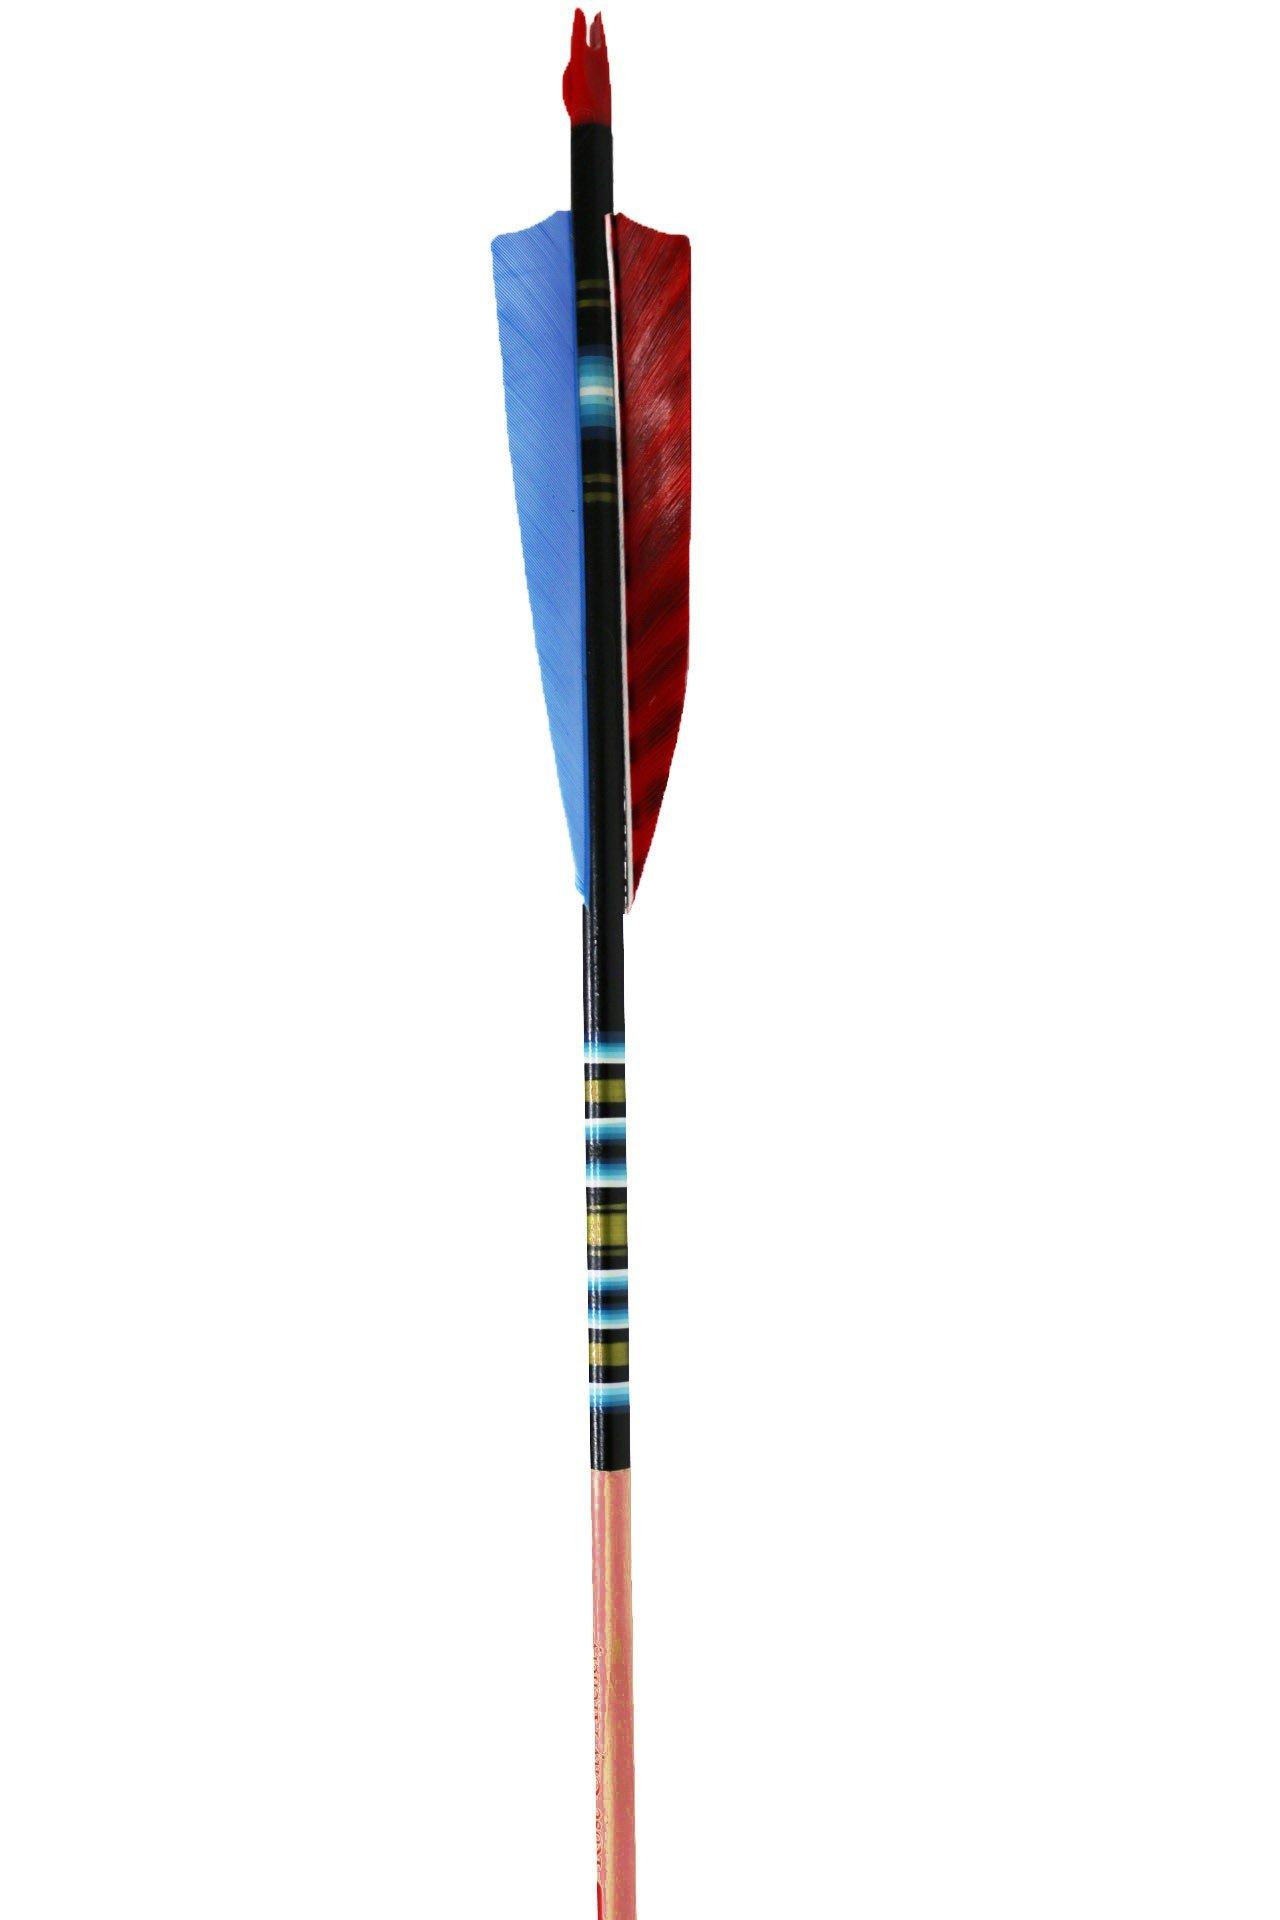 Rose City Archery Port Orford Cedar Fancy Arrows with 4'' Shield Fletch (12 Pack), Black/Mahogany